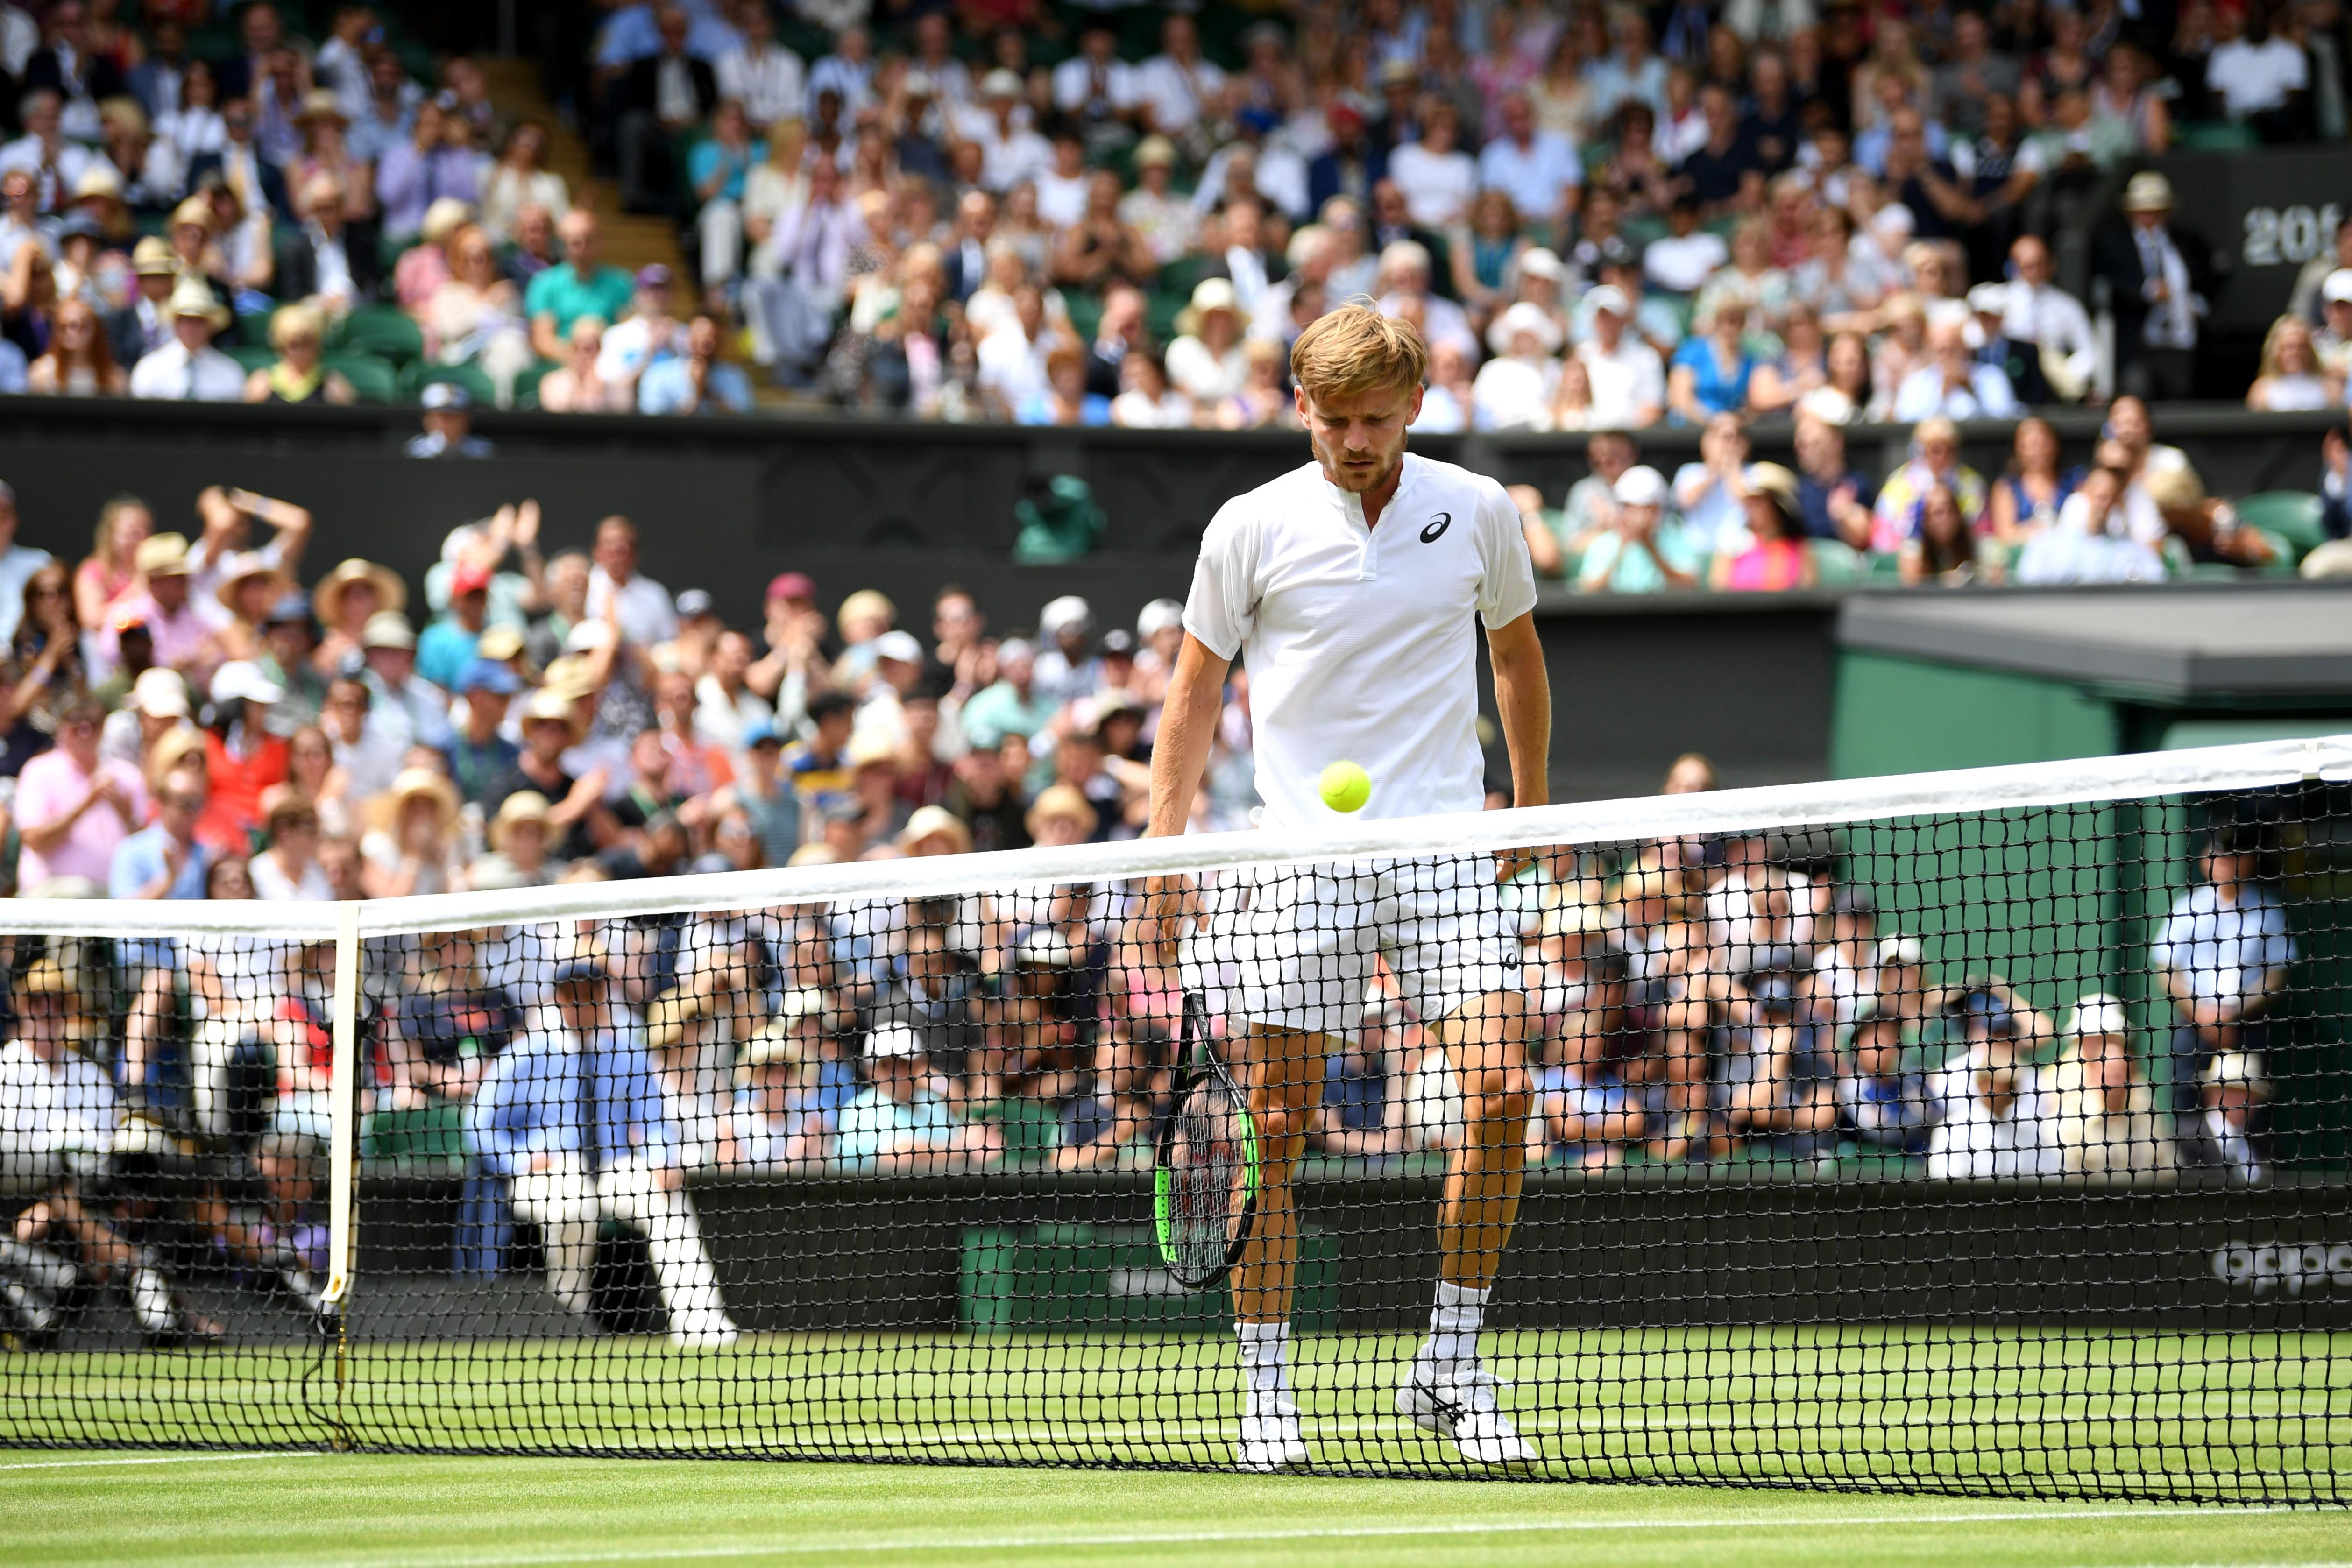 David Goffin lors de son quart de finale face à Novak Djokovic / Wimbledon 2019